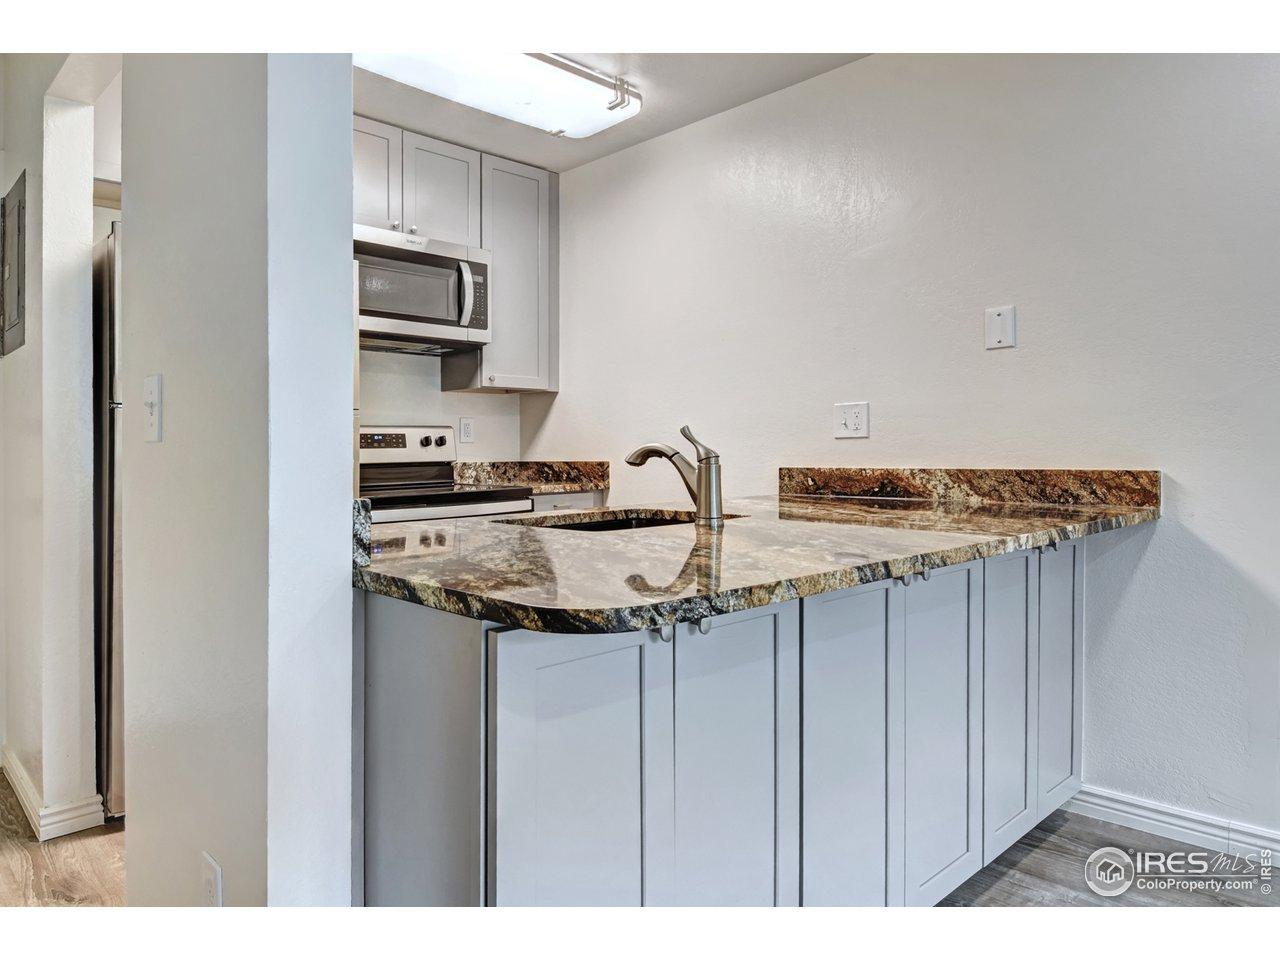 Kitchen sideview